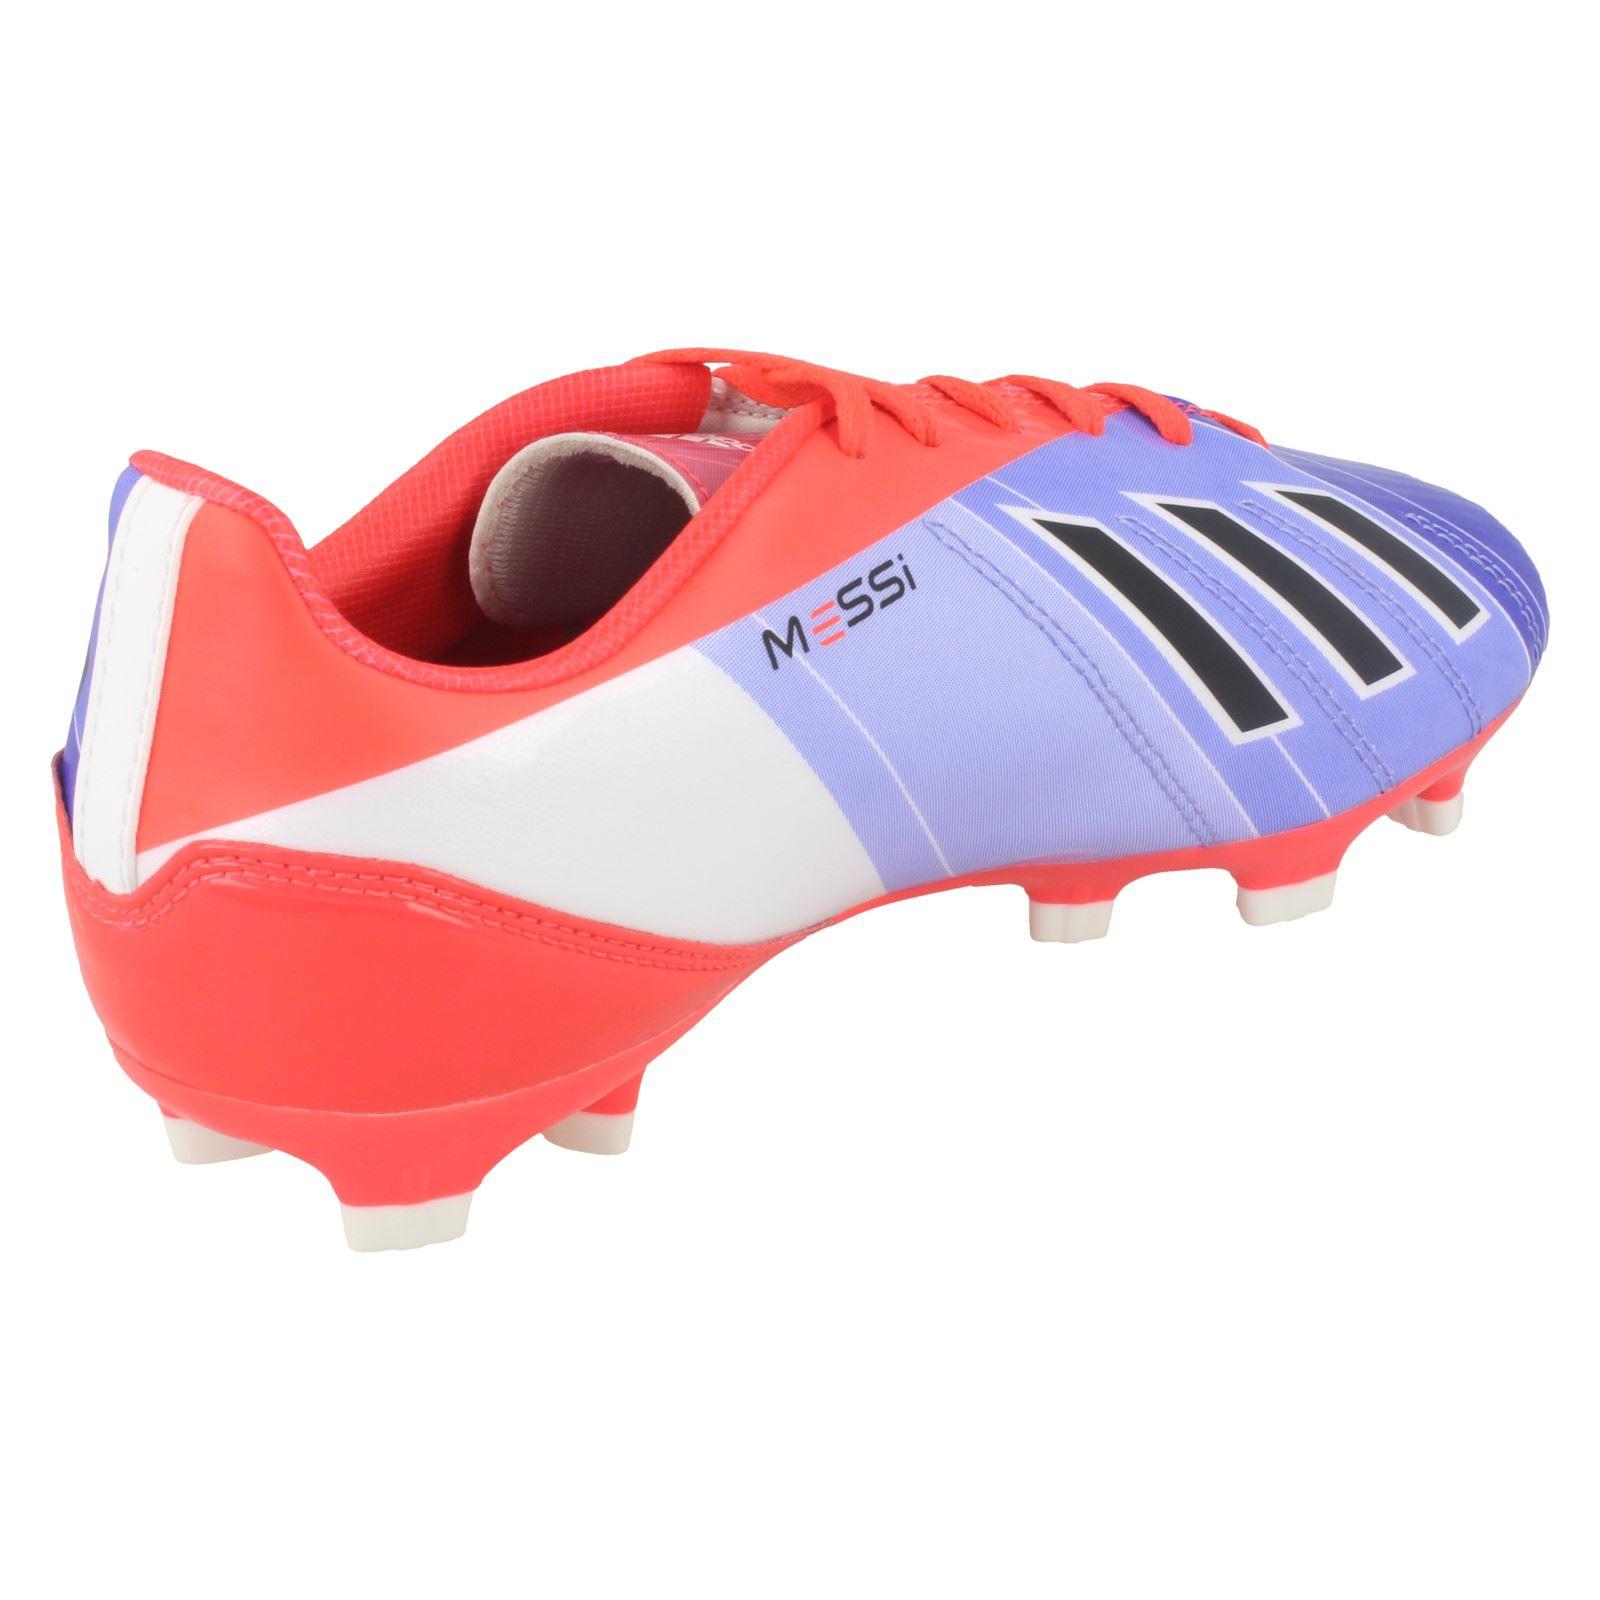 b1cadf178bc5 Boys Adidas Lionel Messi Collection Football Boots F10 TRX FG J | eBay